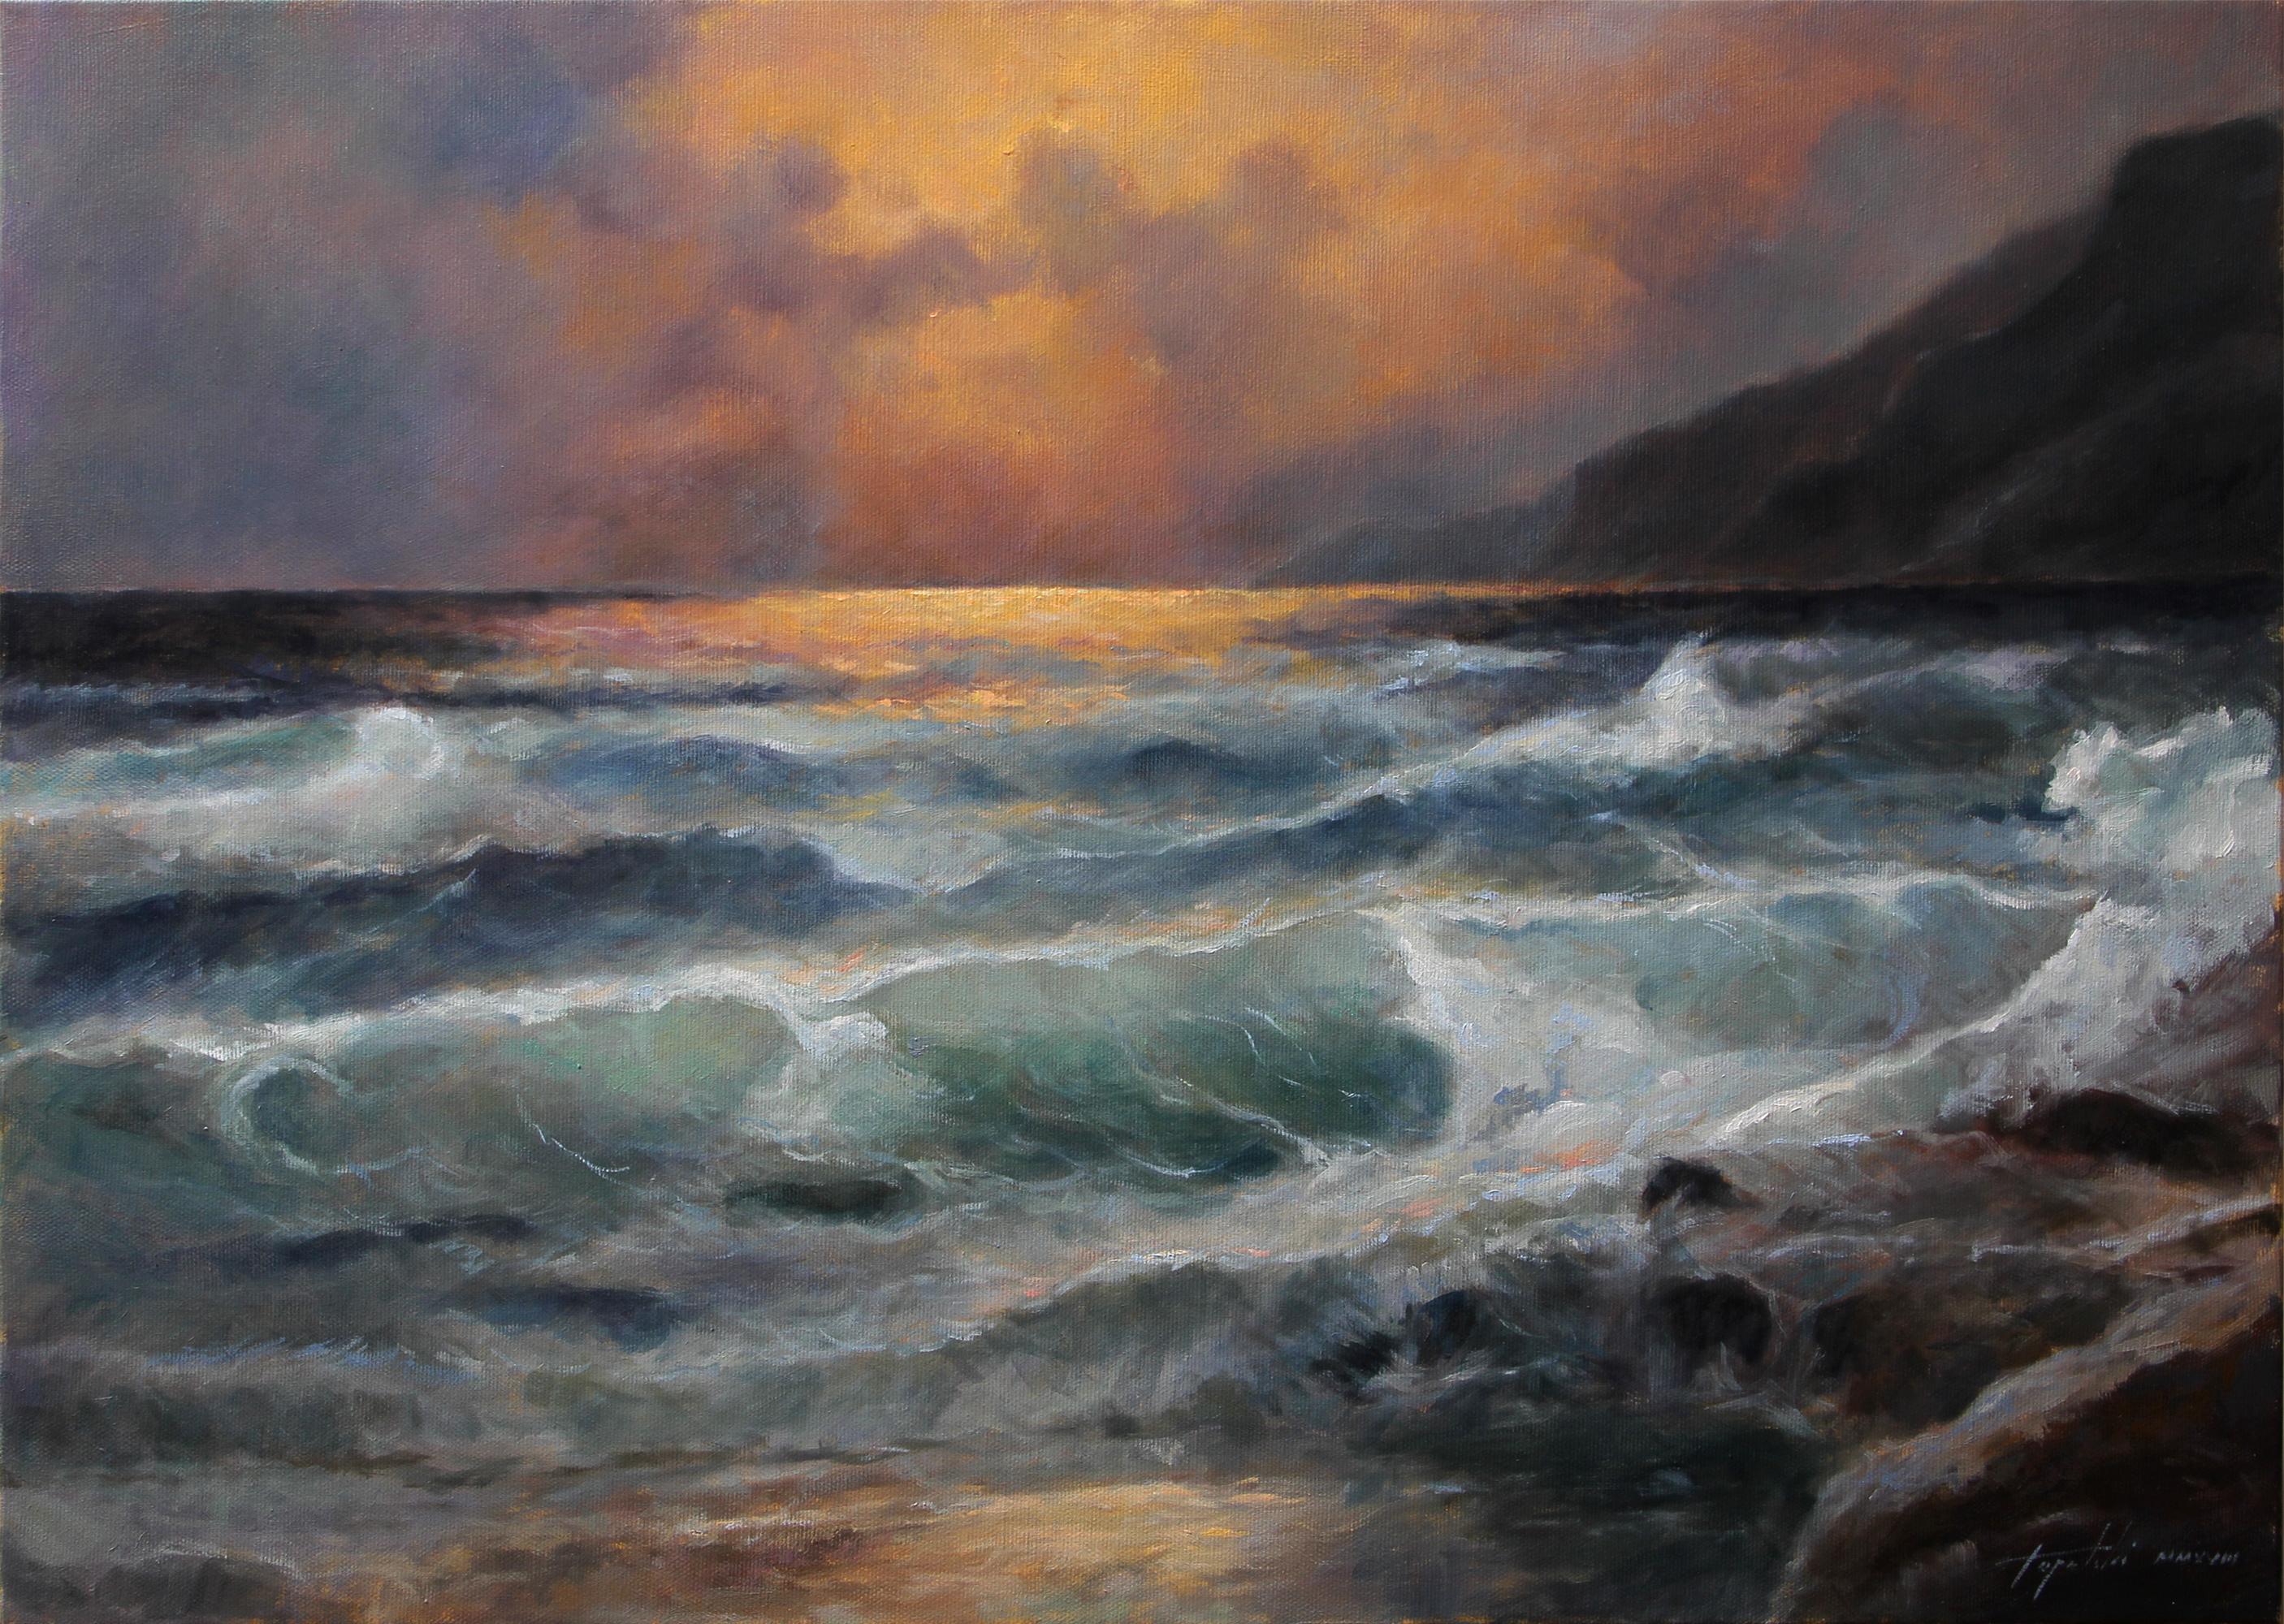 Fine Art By The Coast Seascape Original Oil Painting Artwork On Canvas Artist